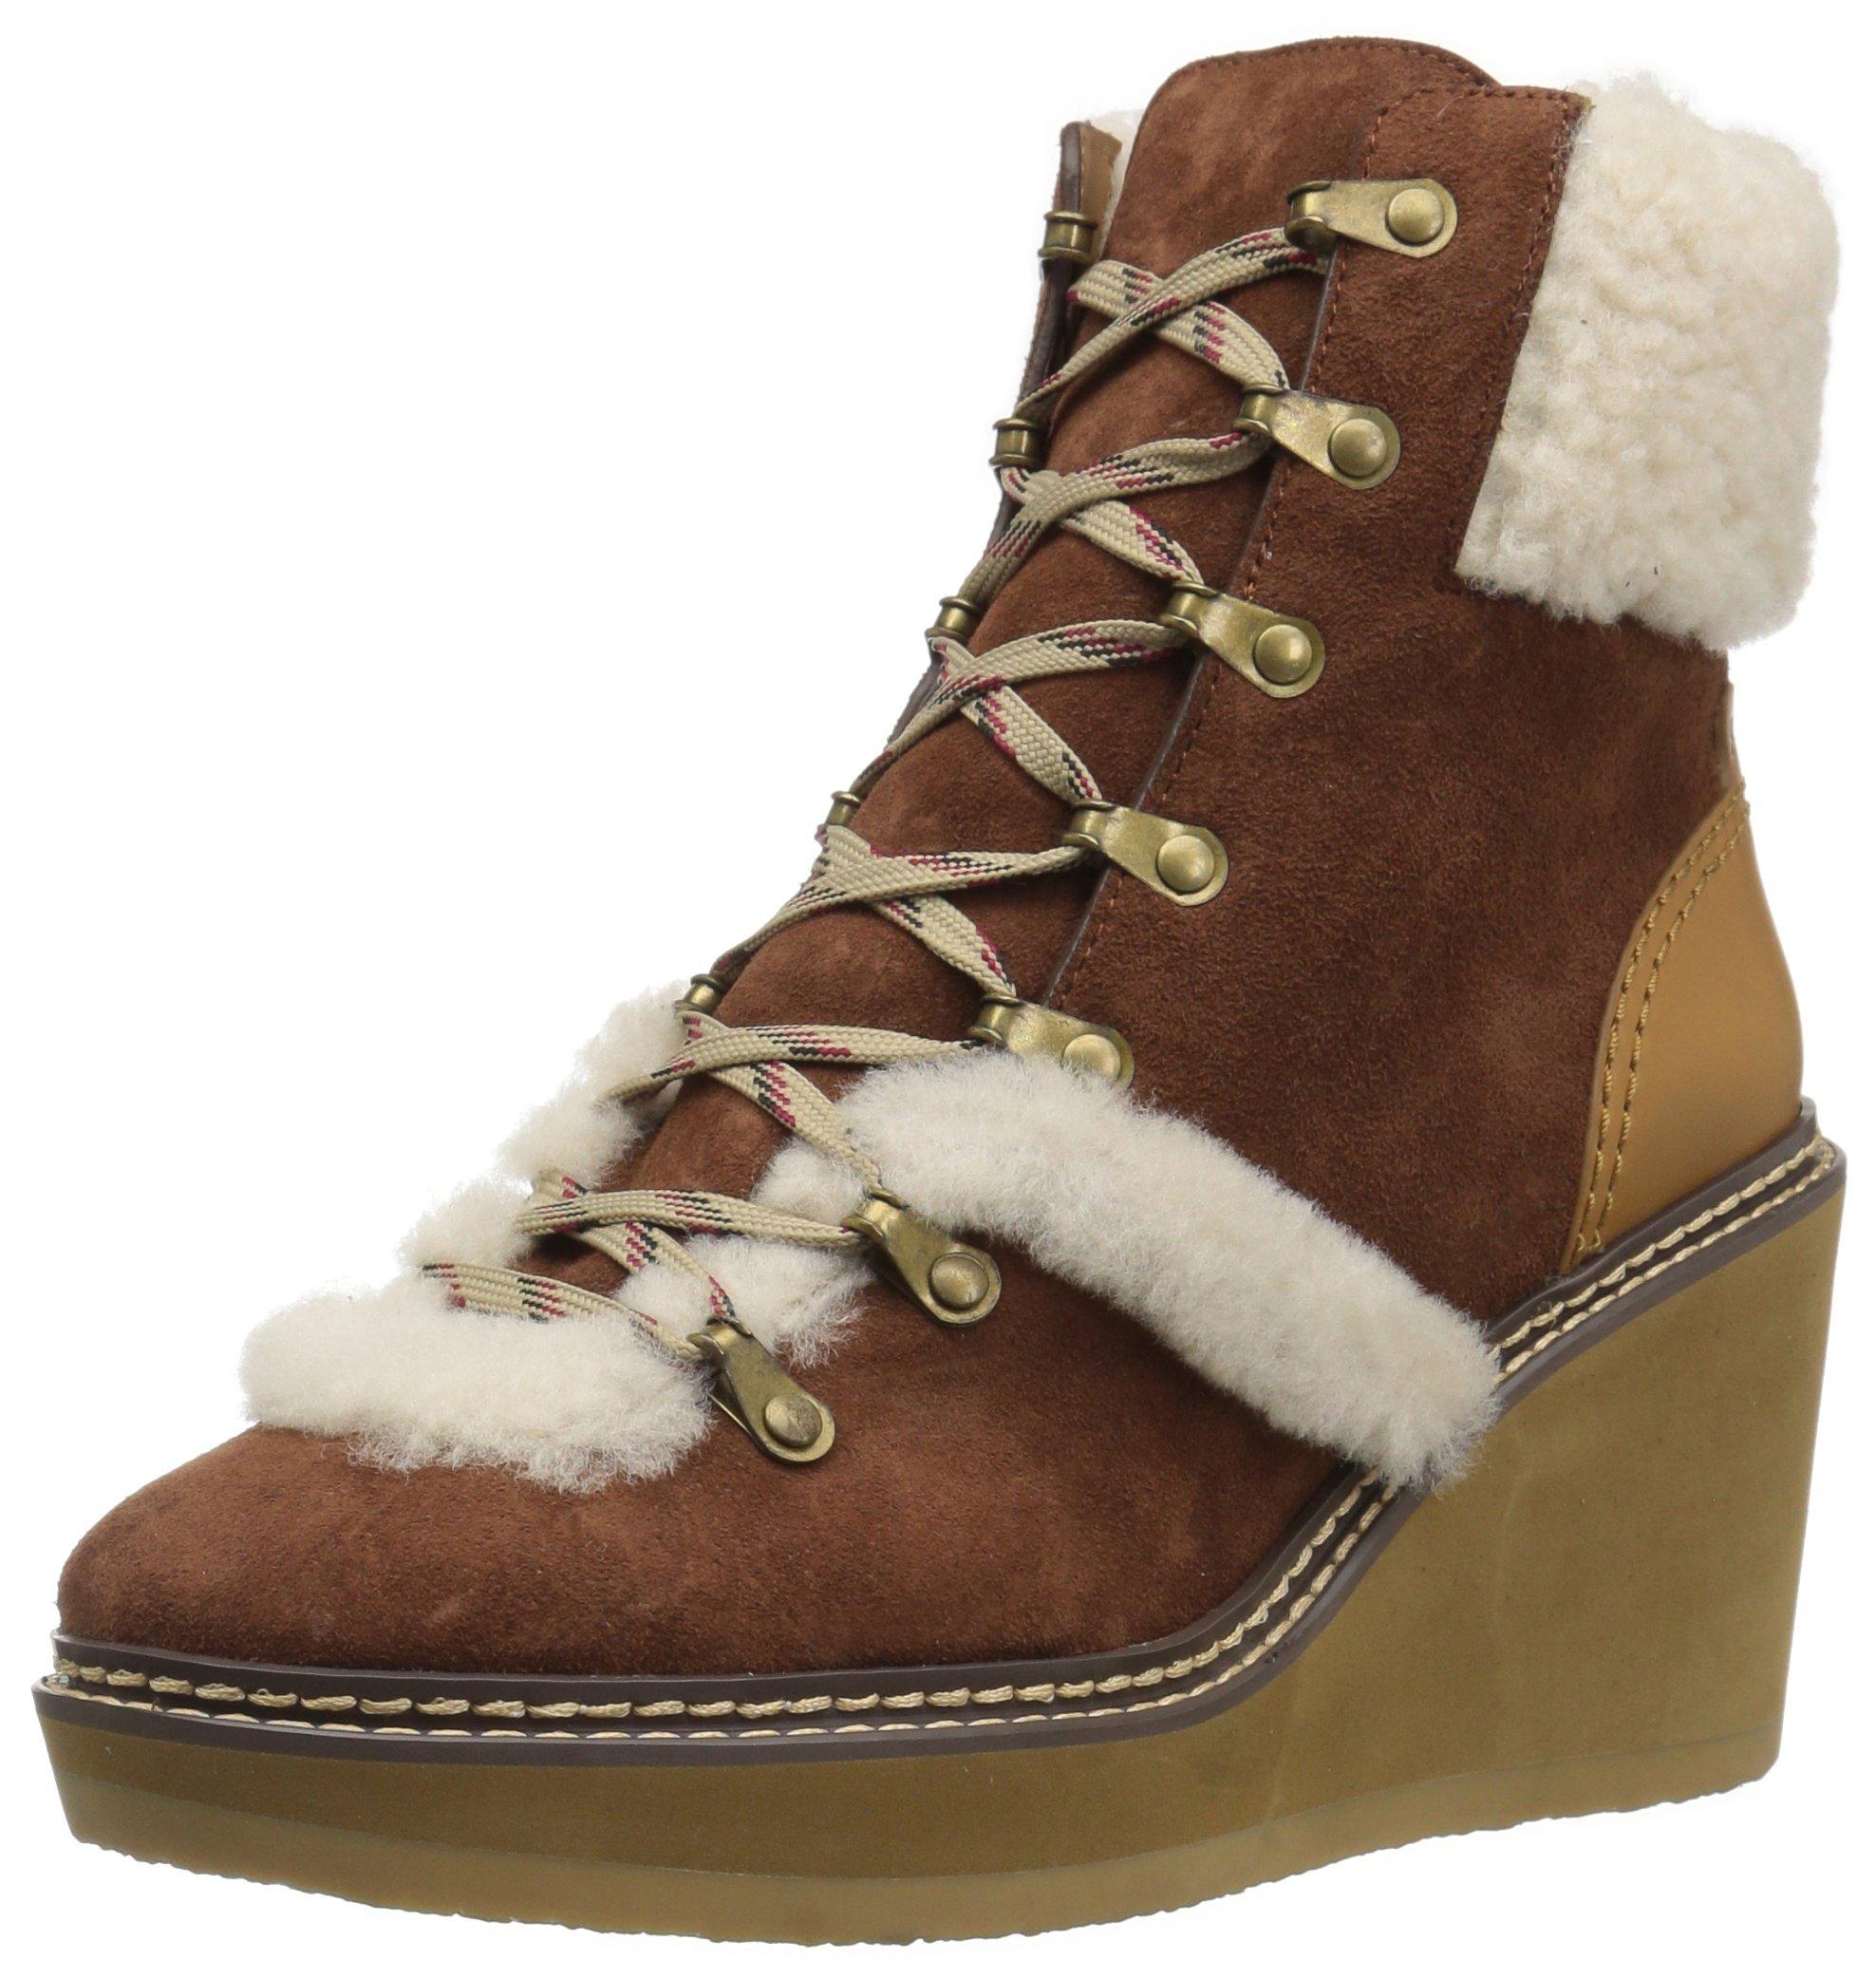 See By Chloe Women's Eileen Wedge W Shearling Fashion Boot, Aztec, 39 M EU (9 US)